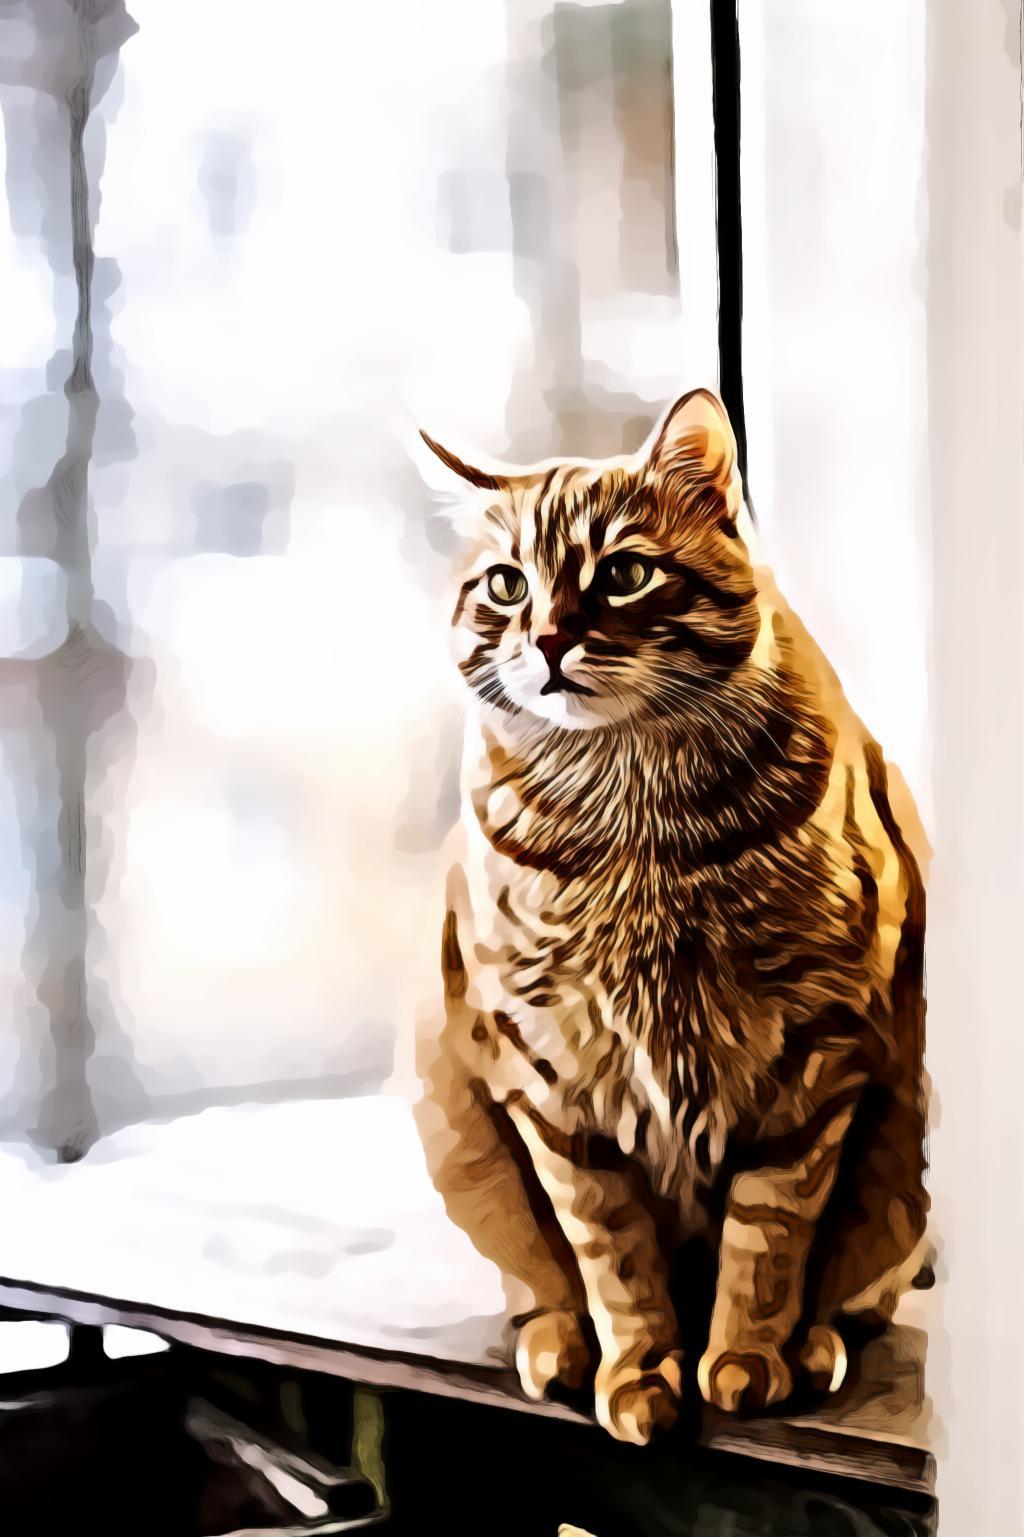 Selective Focus of Orange Tabby Cat